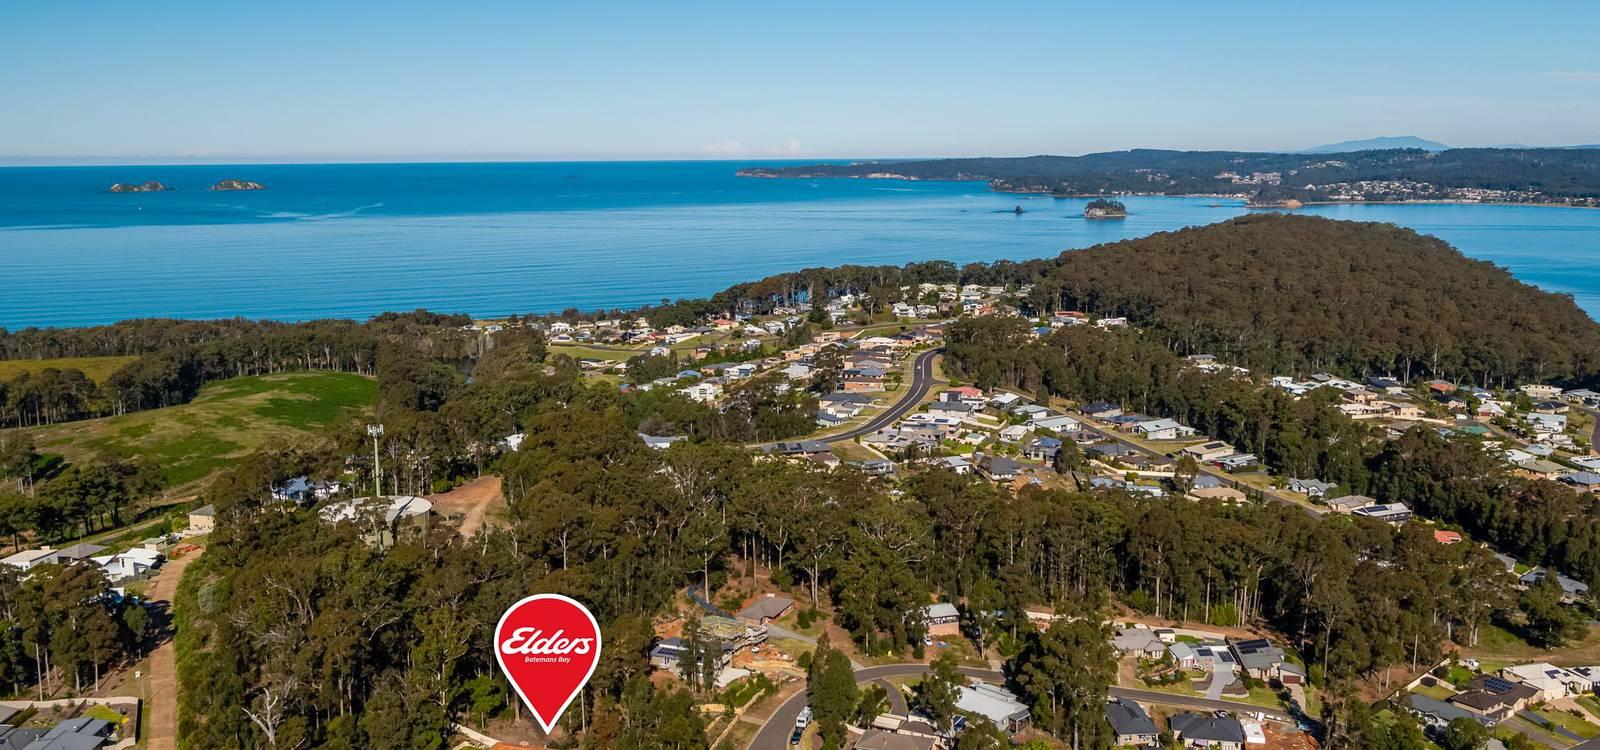 125 Litchfield Crescent LONG BEACH, NSW 2536 - photo 1